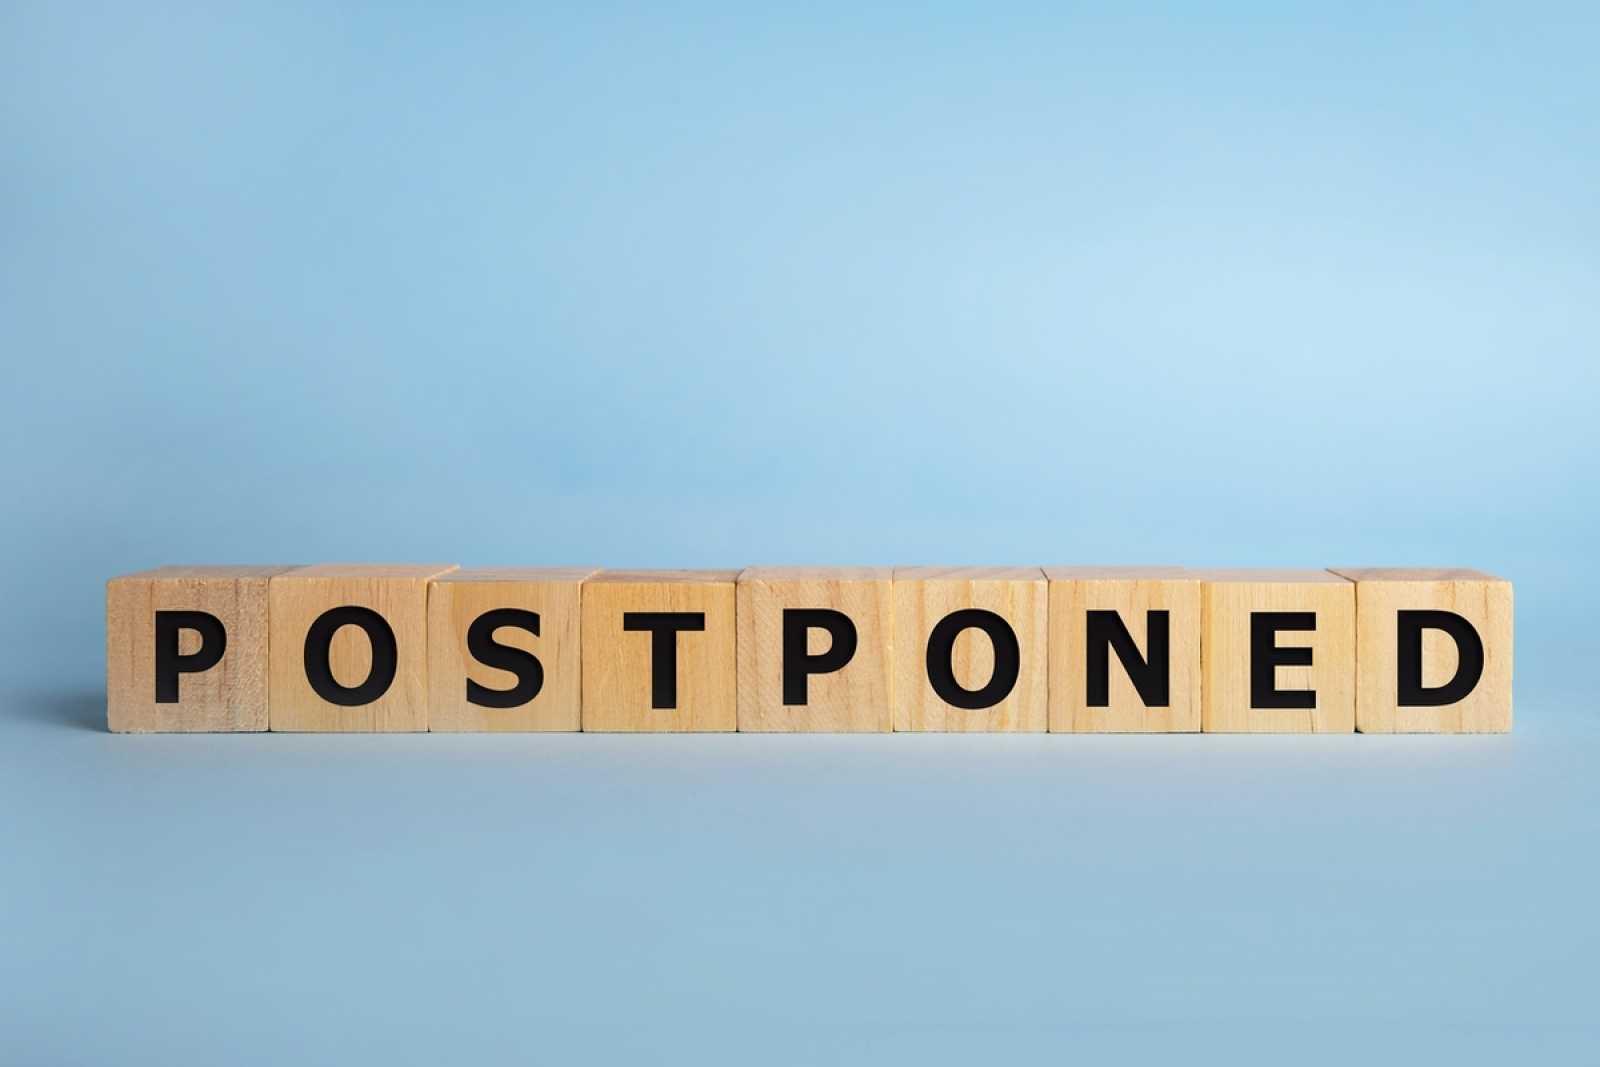 Postponed imo